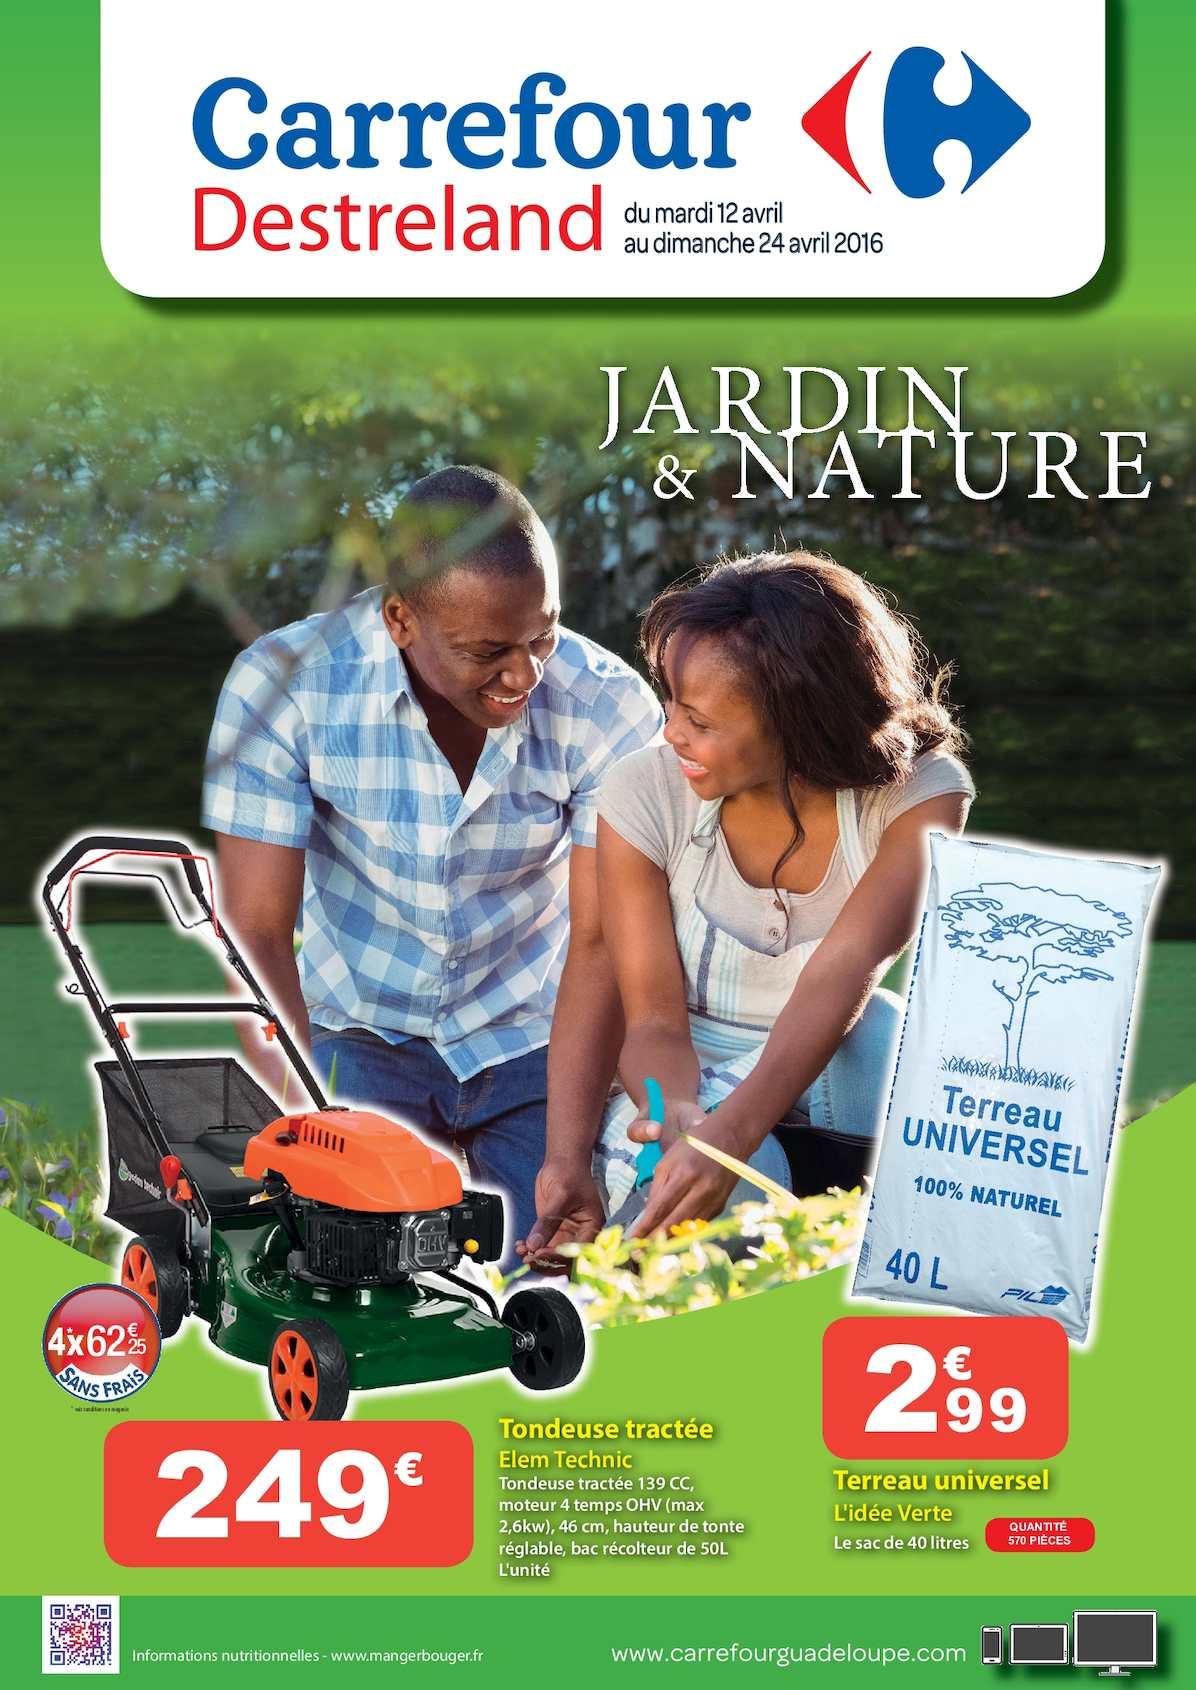 Calaméo - Carrefour Catalogue Jardin & Nature concernant Salon Jardin Resine Carrefour